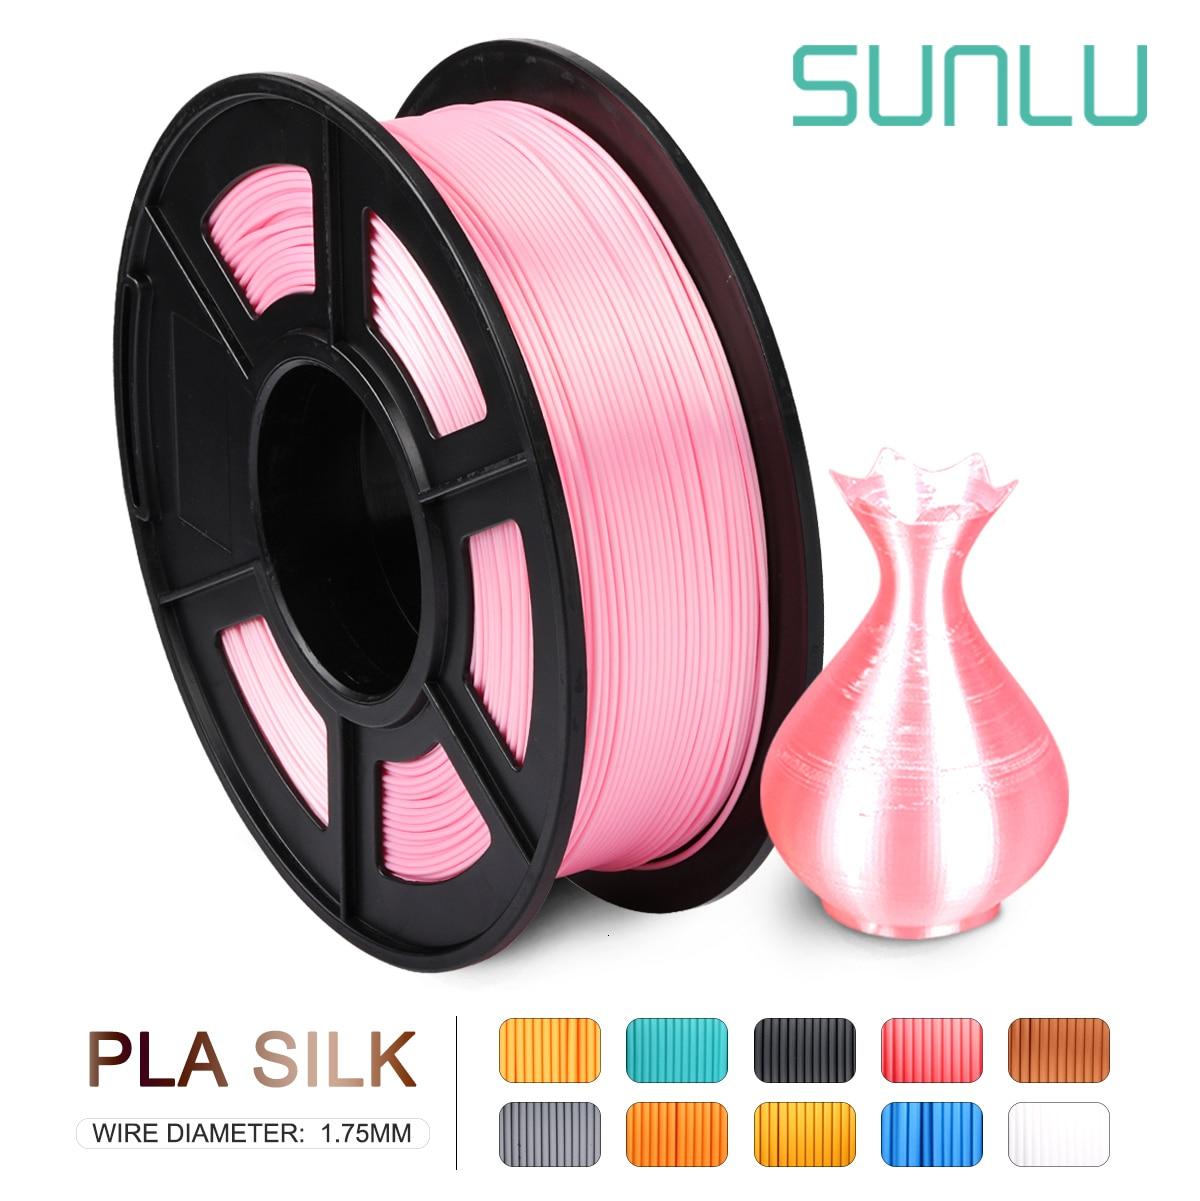 Filamento de seda PLA Rosa 1kg 2,2 lbs 1,75mm por rollo filamento de impresora 3D DIY para Recargas de pluma 3D Material Biodegradable KIT de actualización PLA 2,0 Asistente de estacionamiento frontal 4K a 12K para VW Tiguan 5N 3AA 919 475 M/S